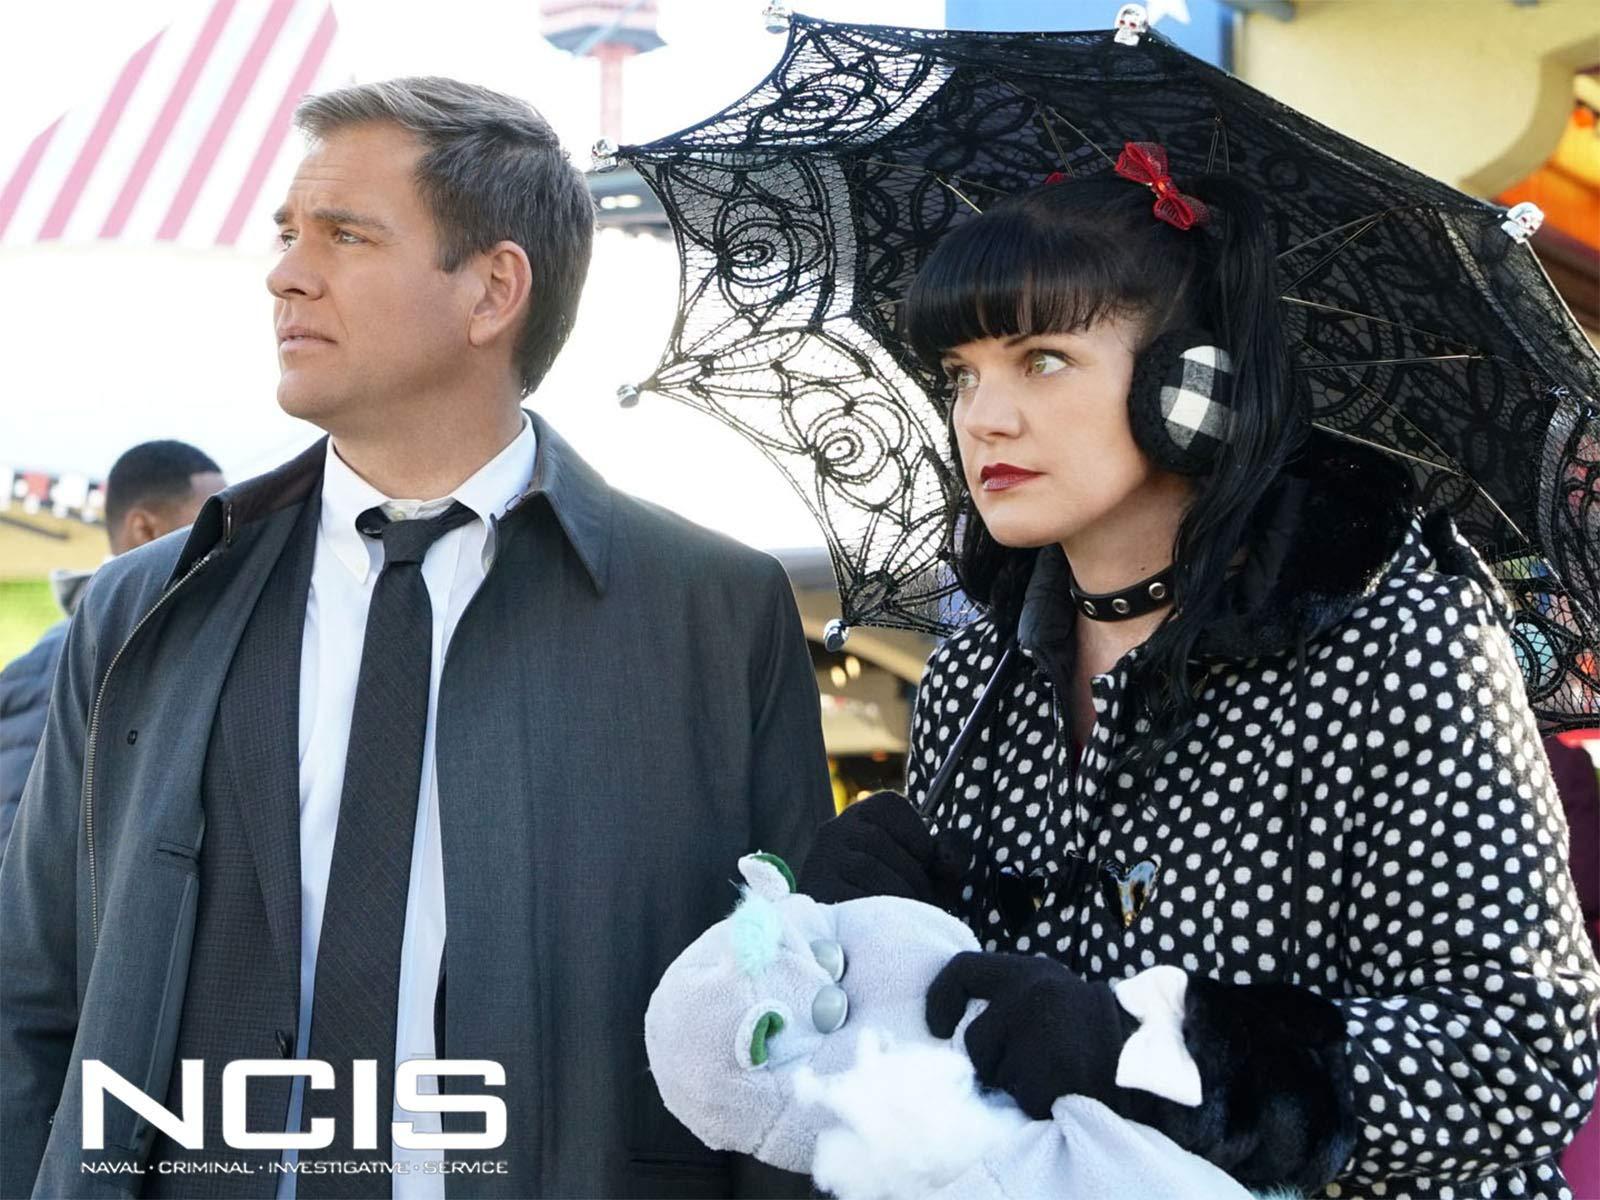 watch ncis season 13 episode 24 free